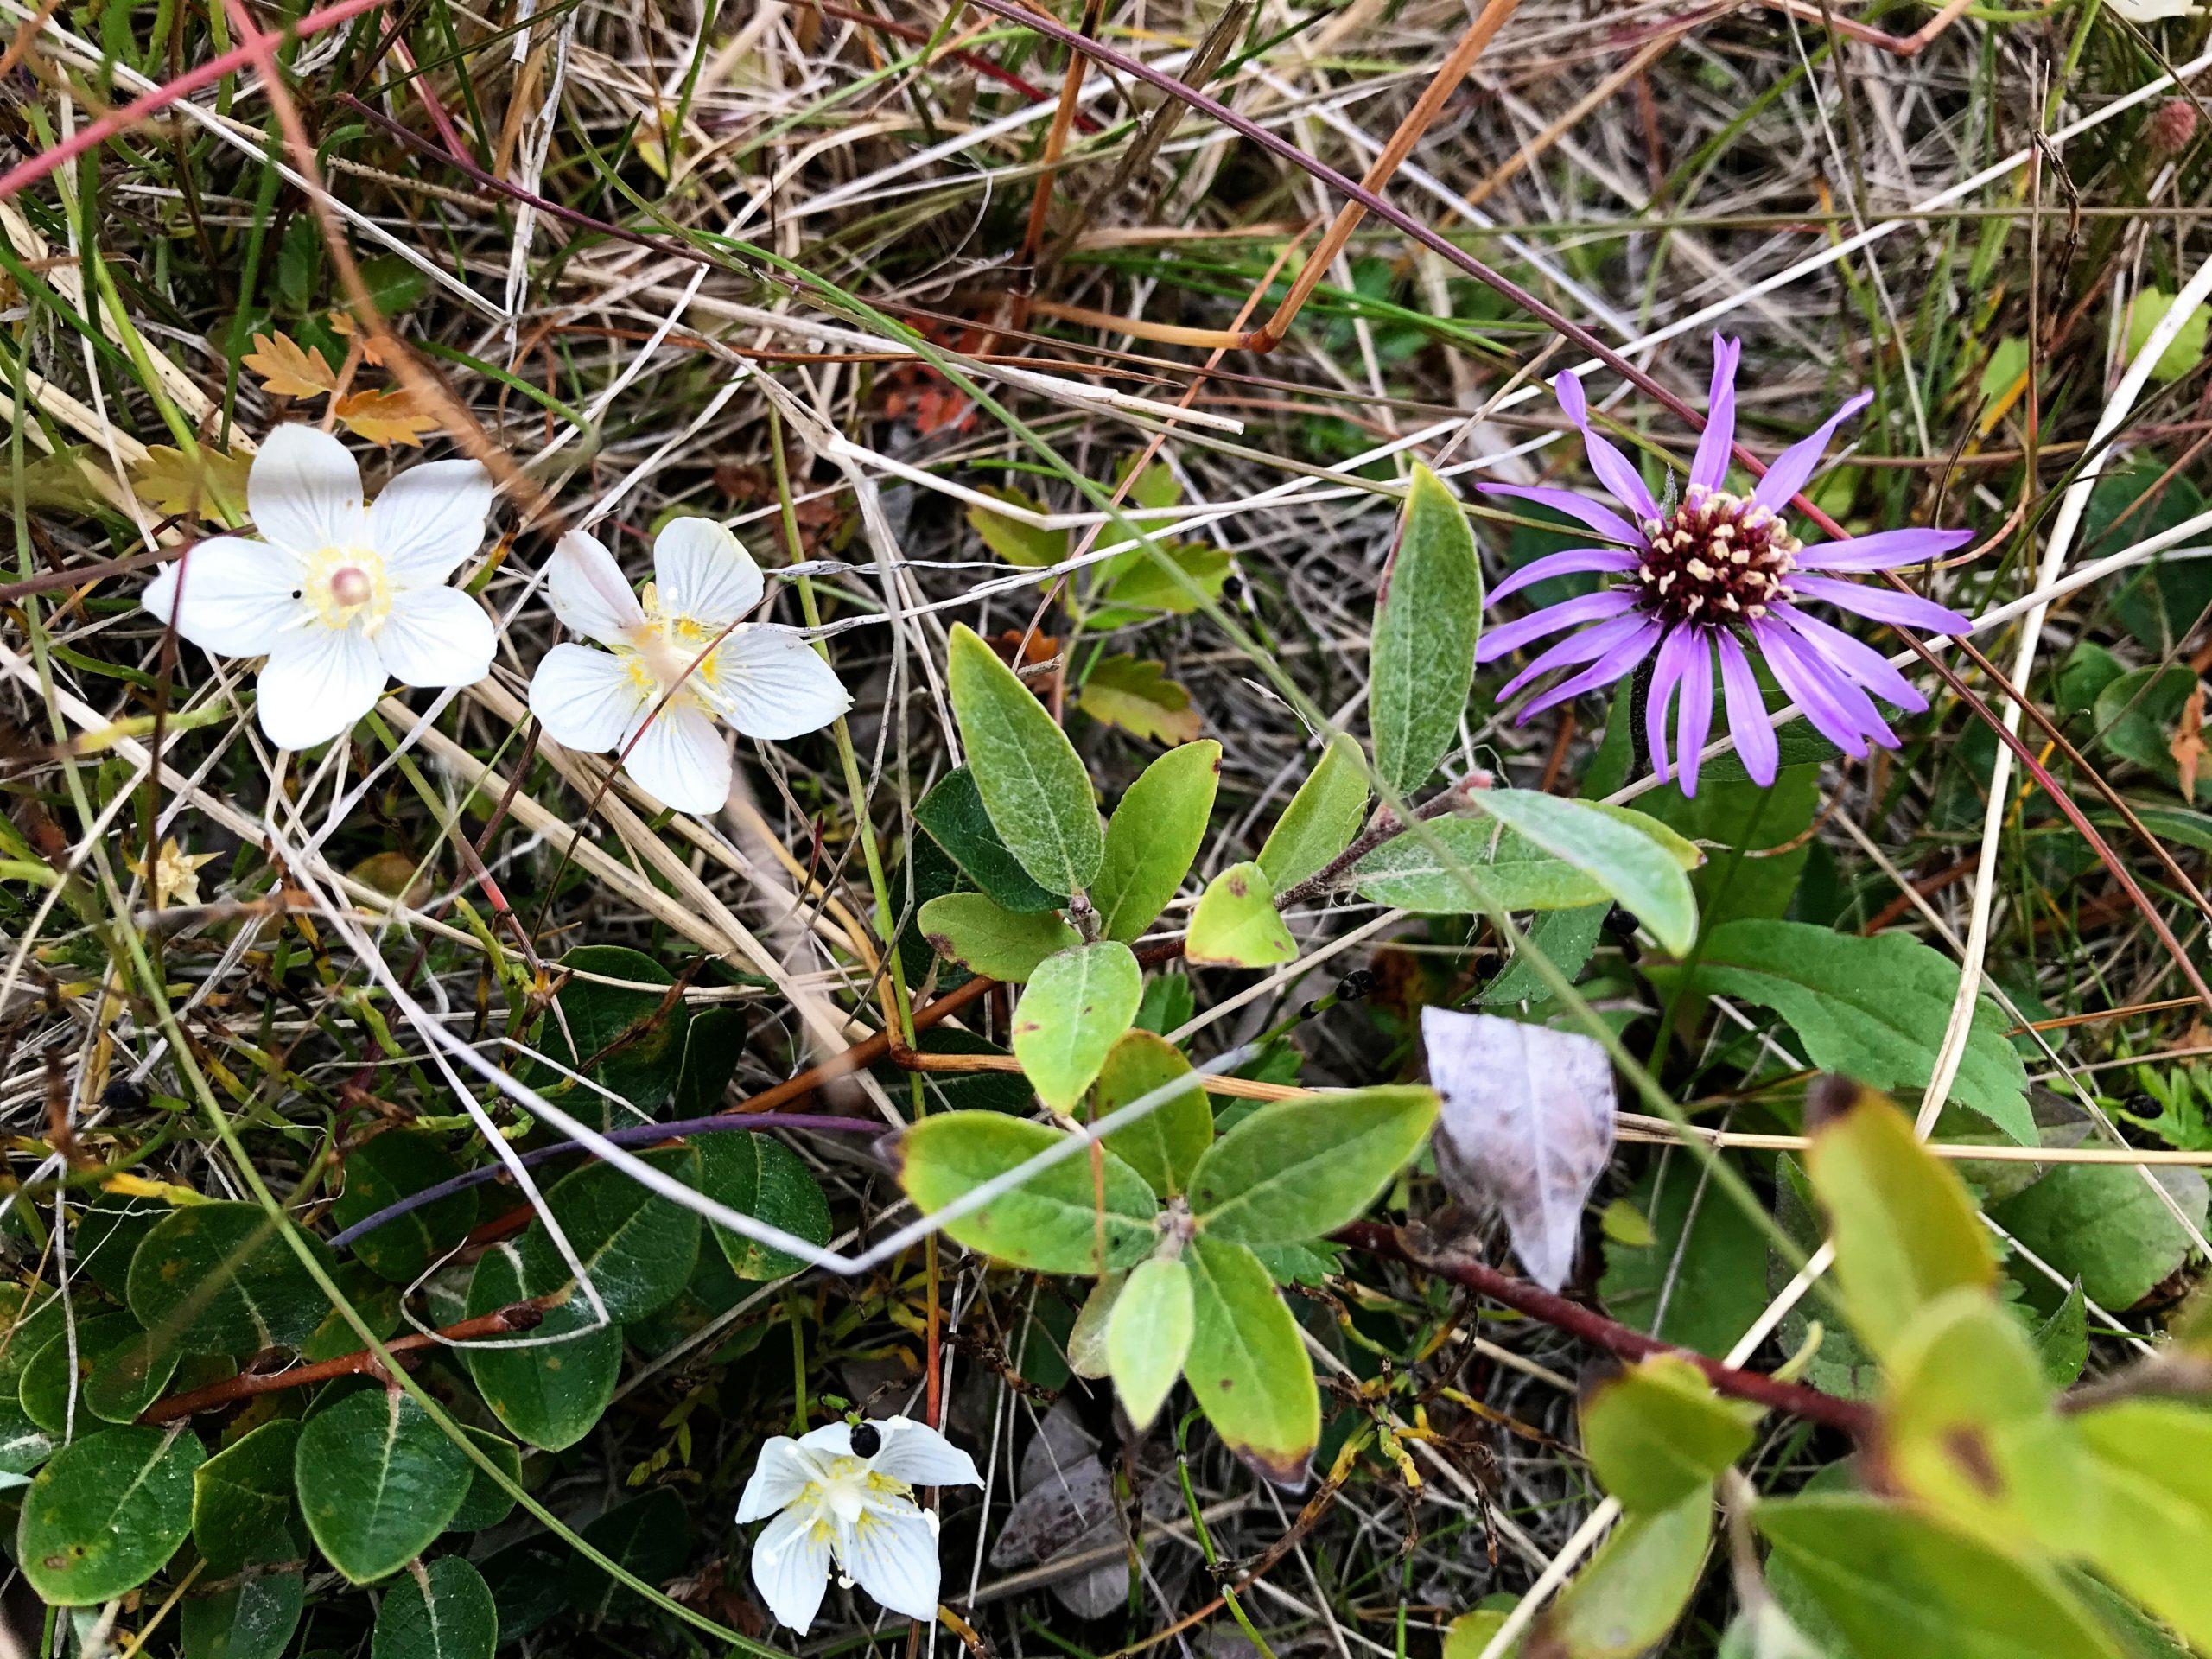 Tundra Flowers Yellow and Purple